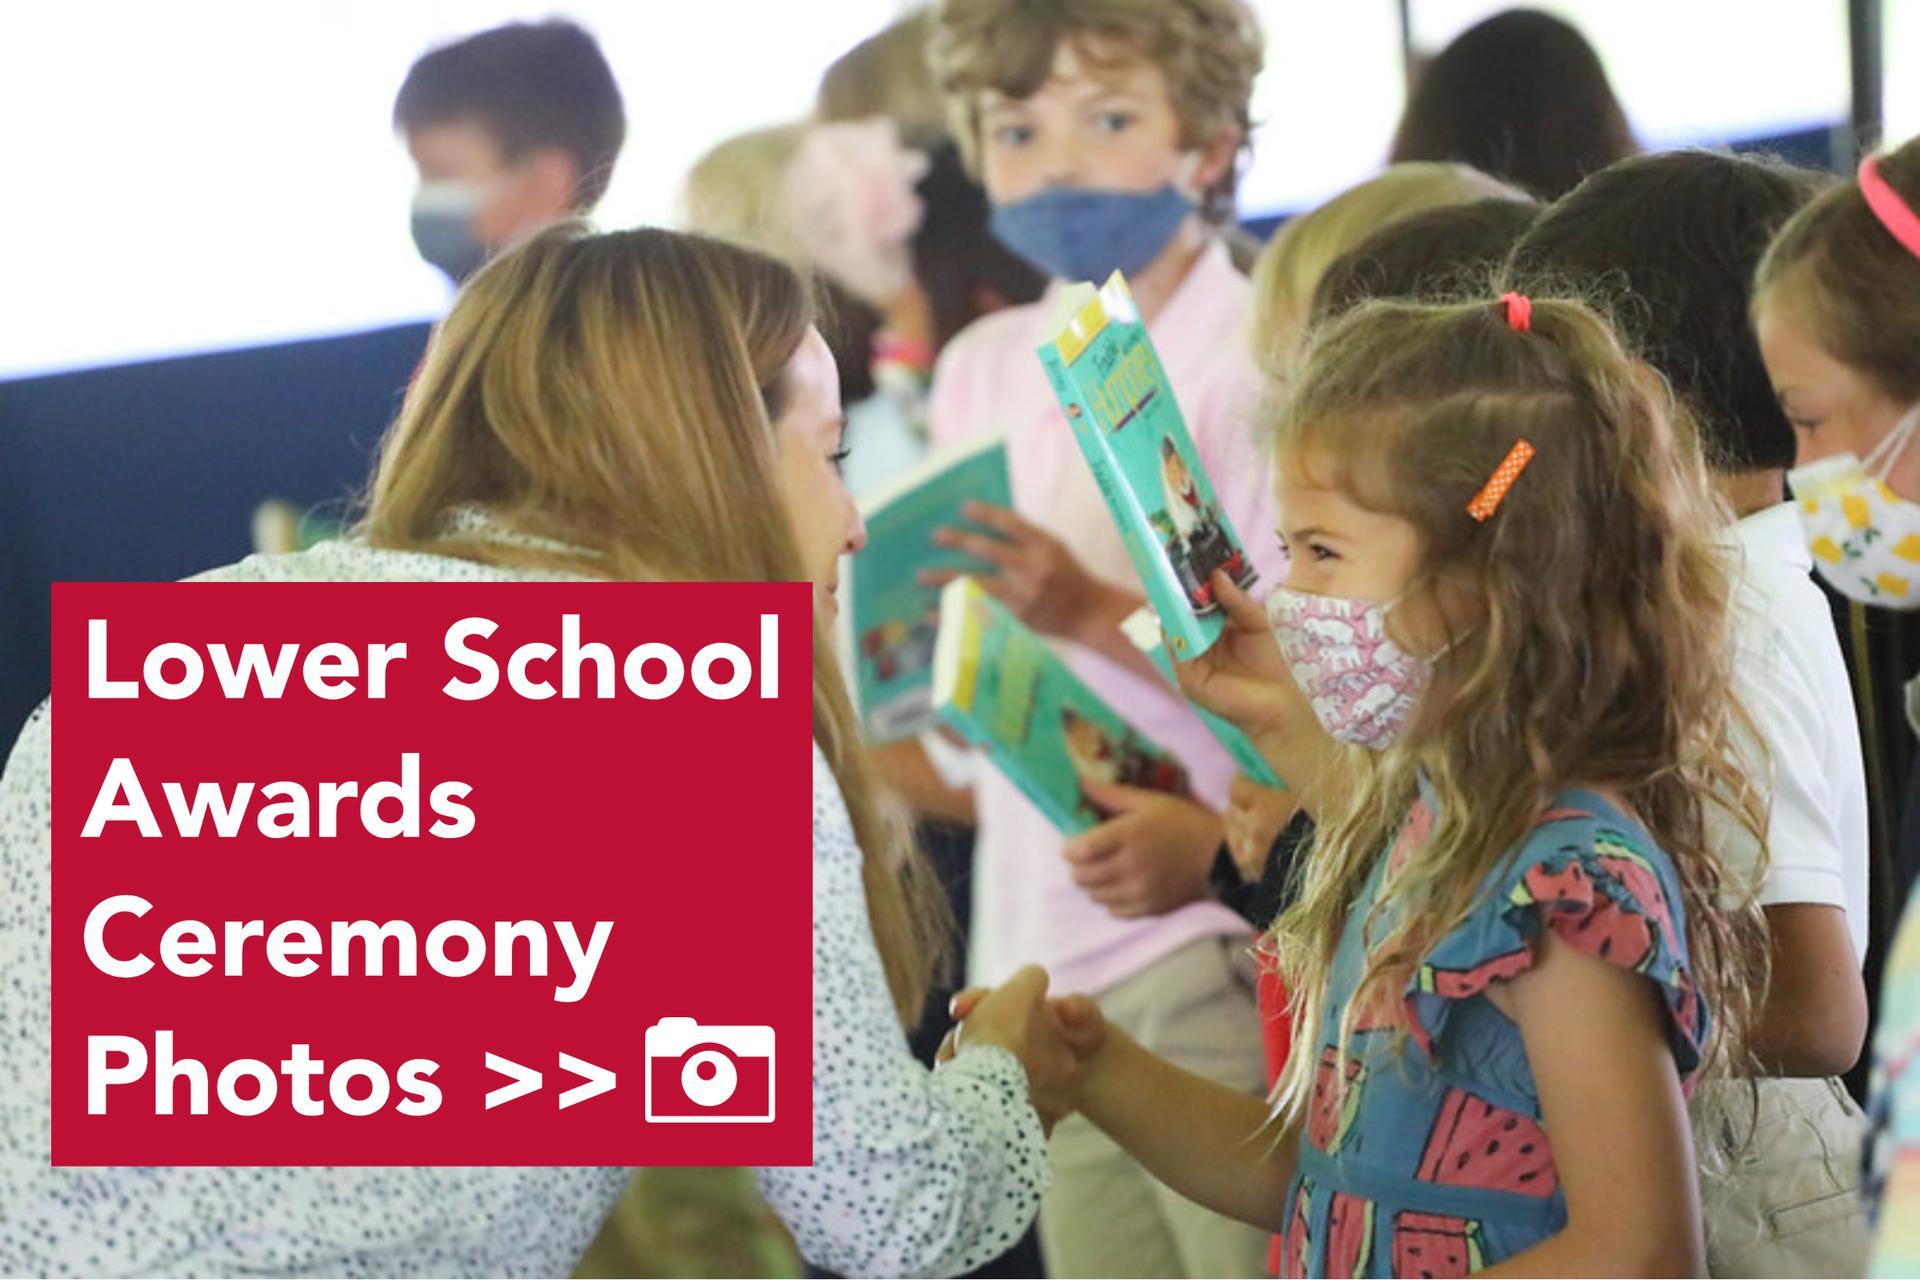 Lower School Awards